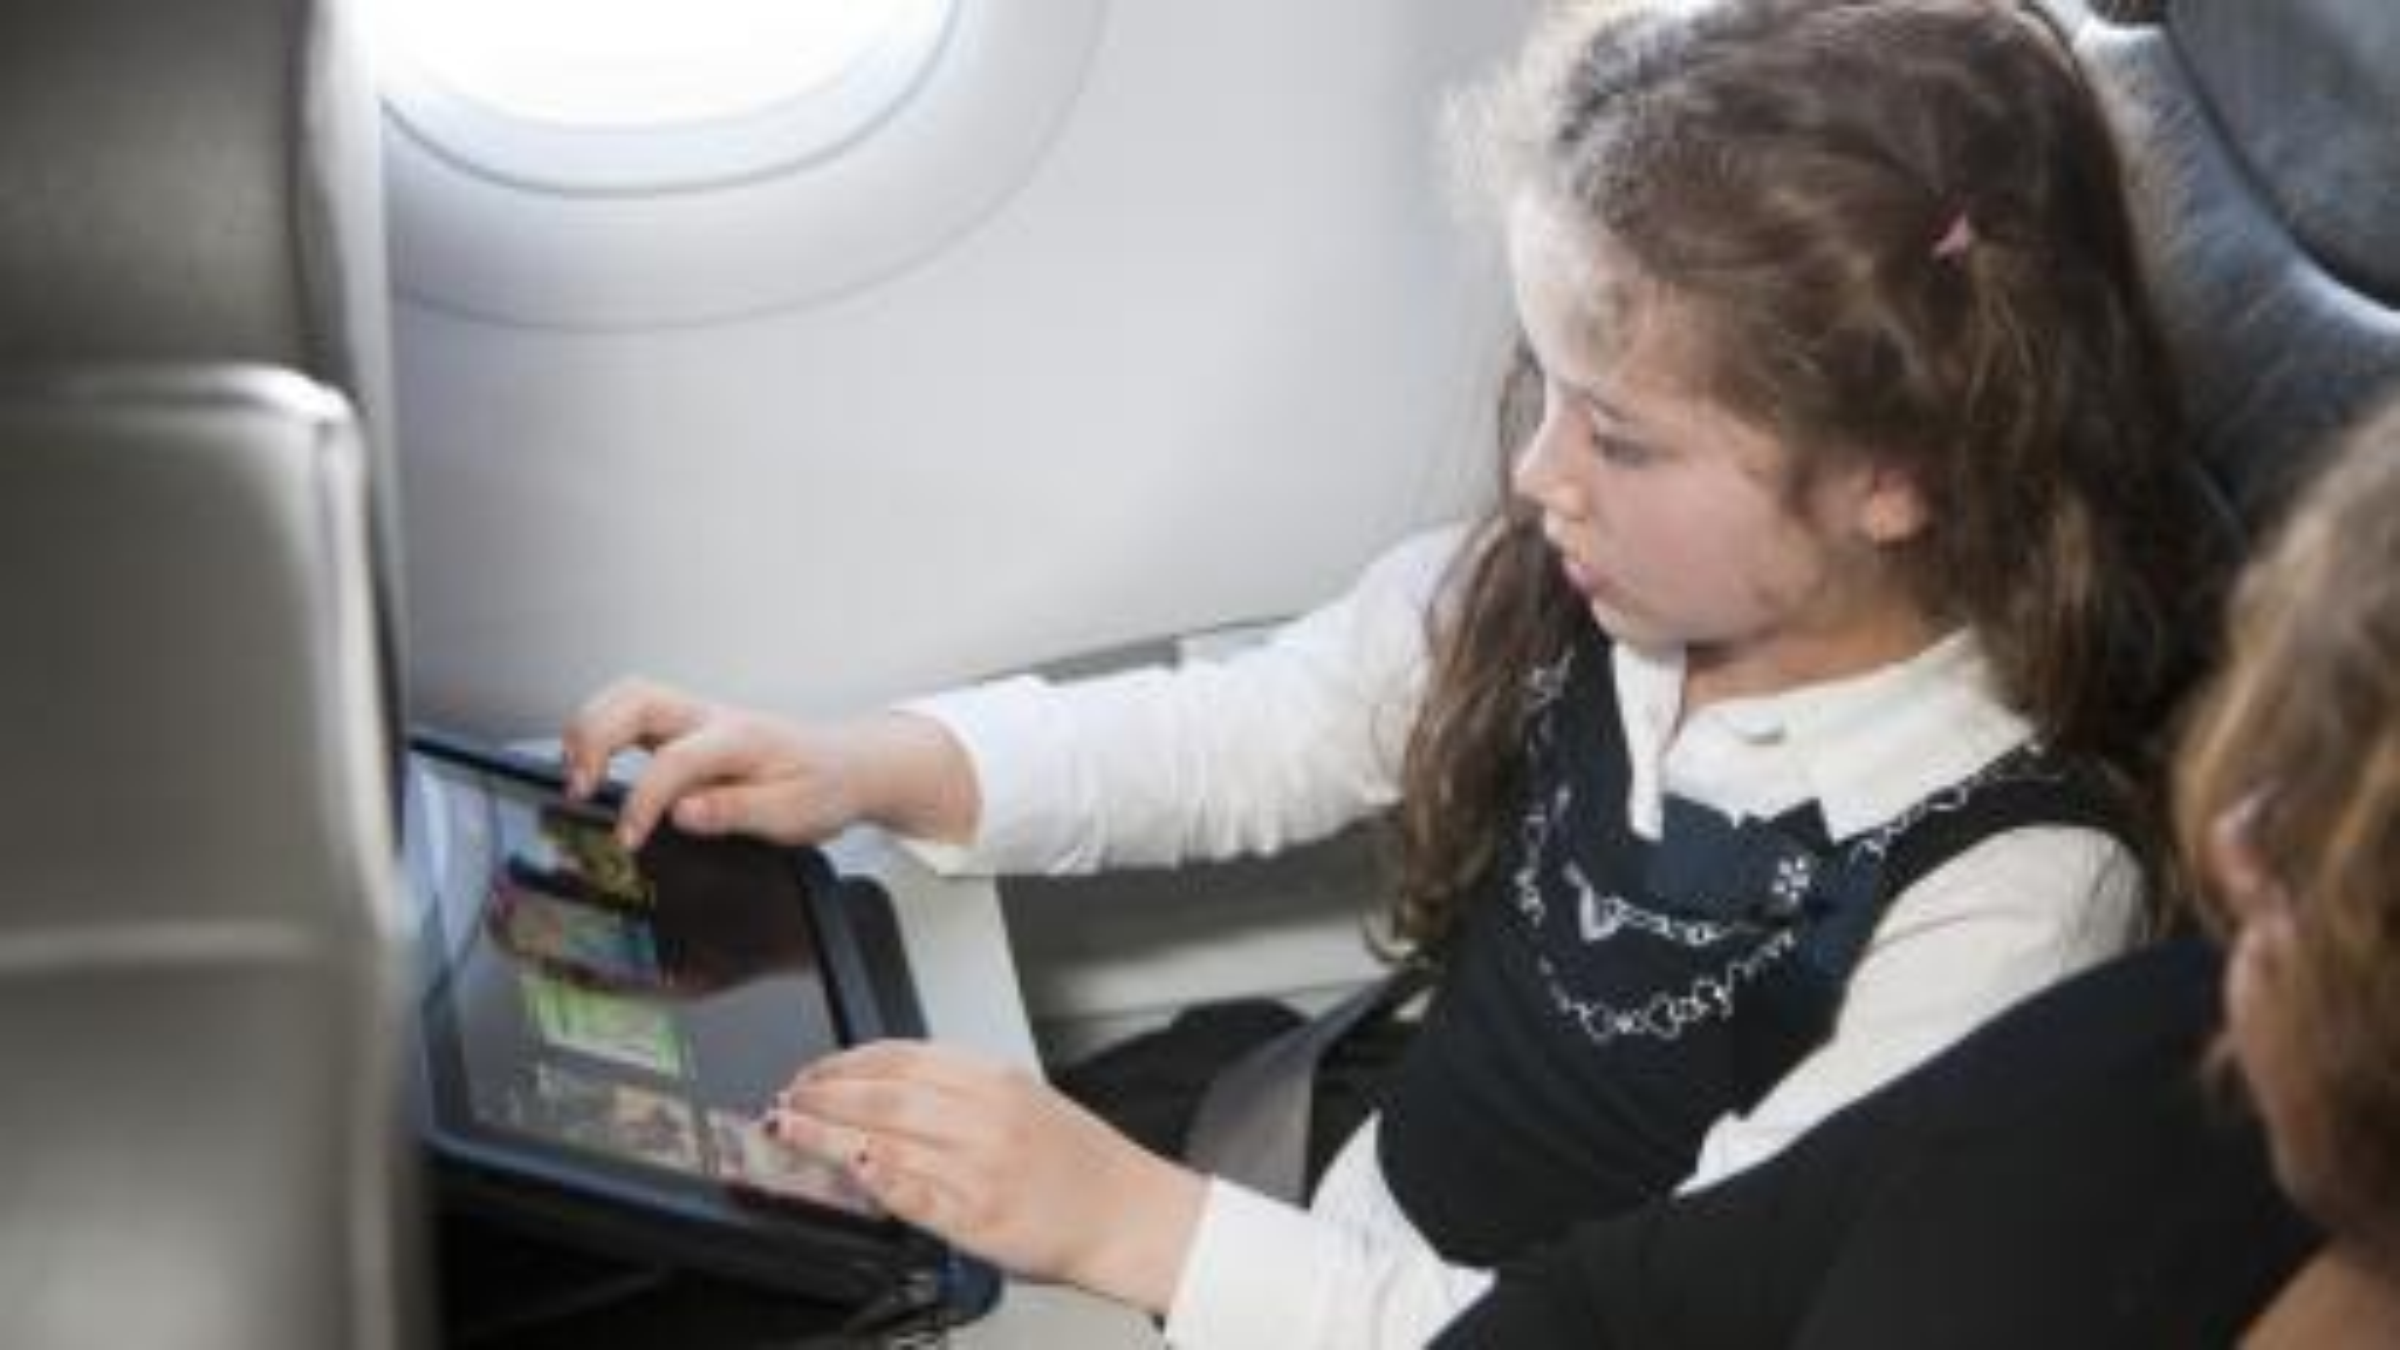 iPads on a plane